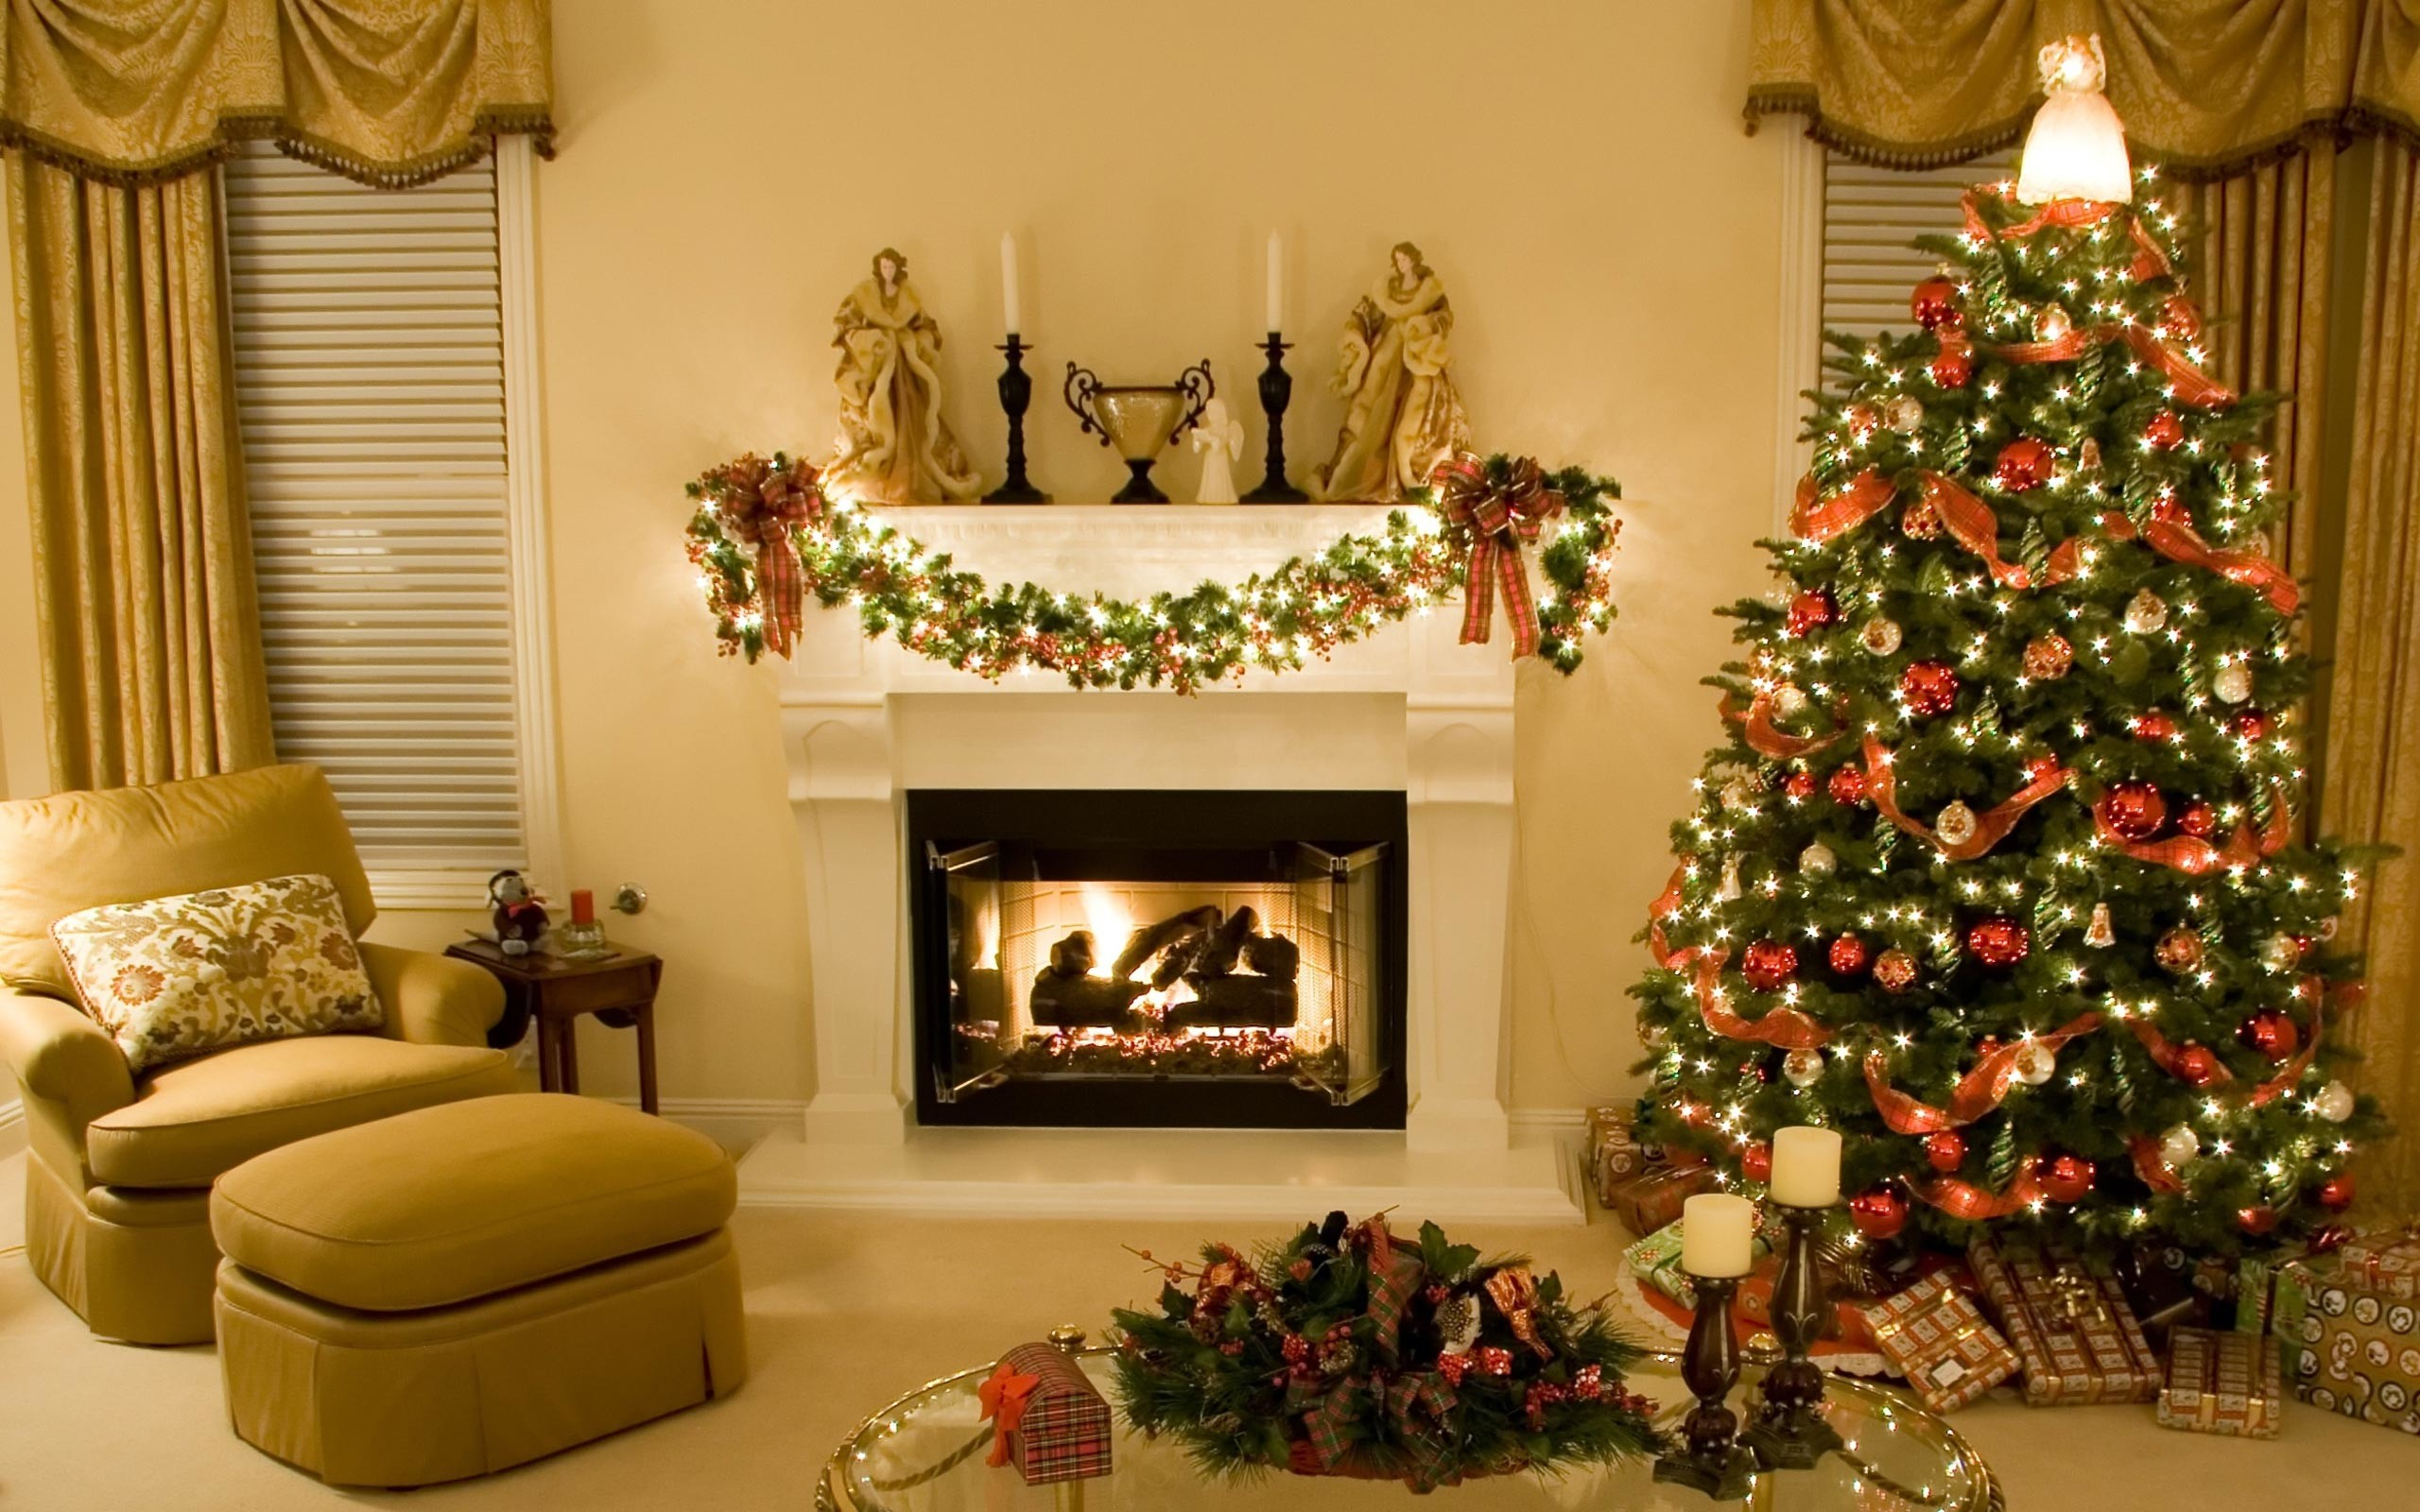 modern-christmas-home-fireplace-christmas-tree-gifts-free-